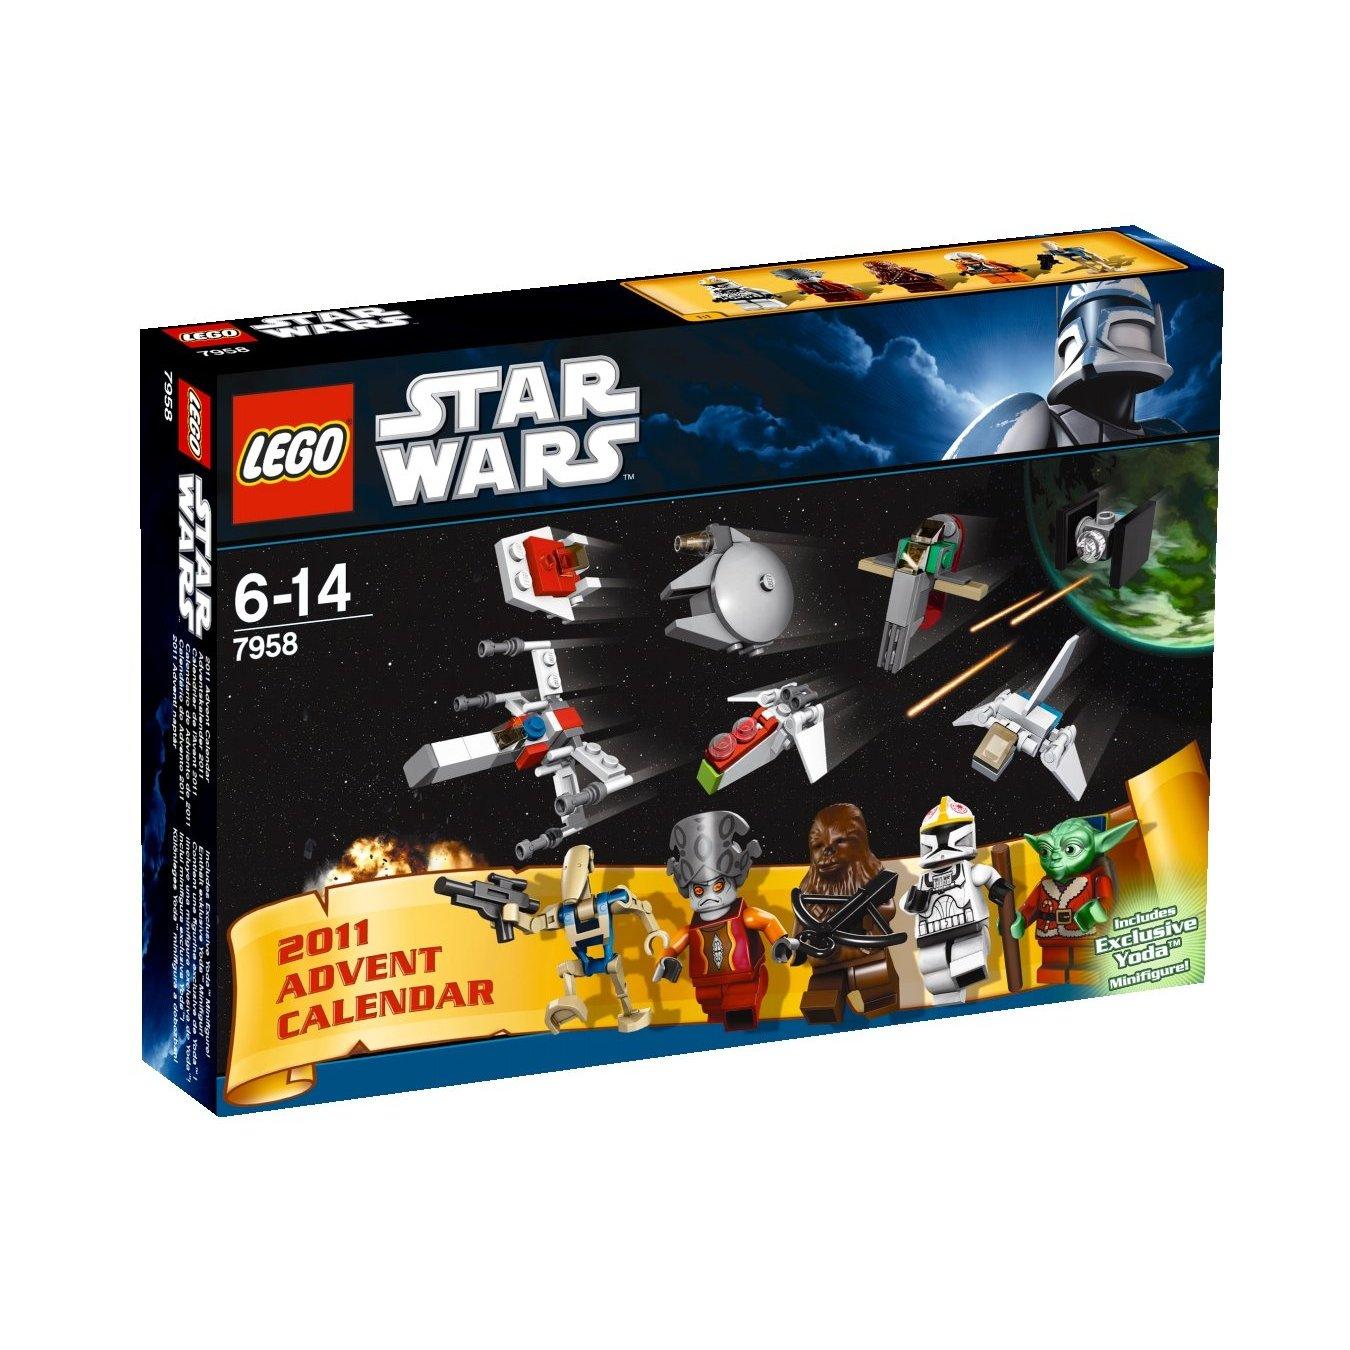 Calendrier De L Avent Lego Star Wars Carrefour.Vis Ma Vie D Afol Adult Fan Of Lego Club Comics